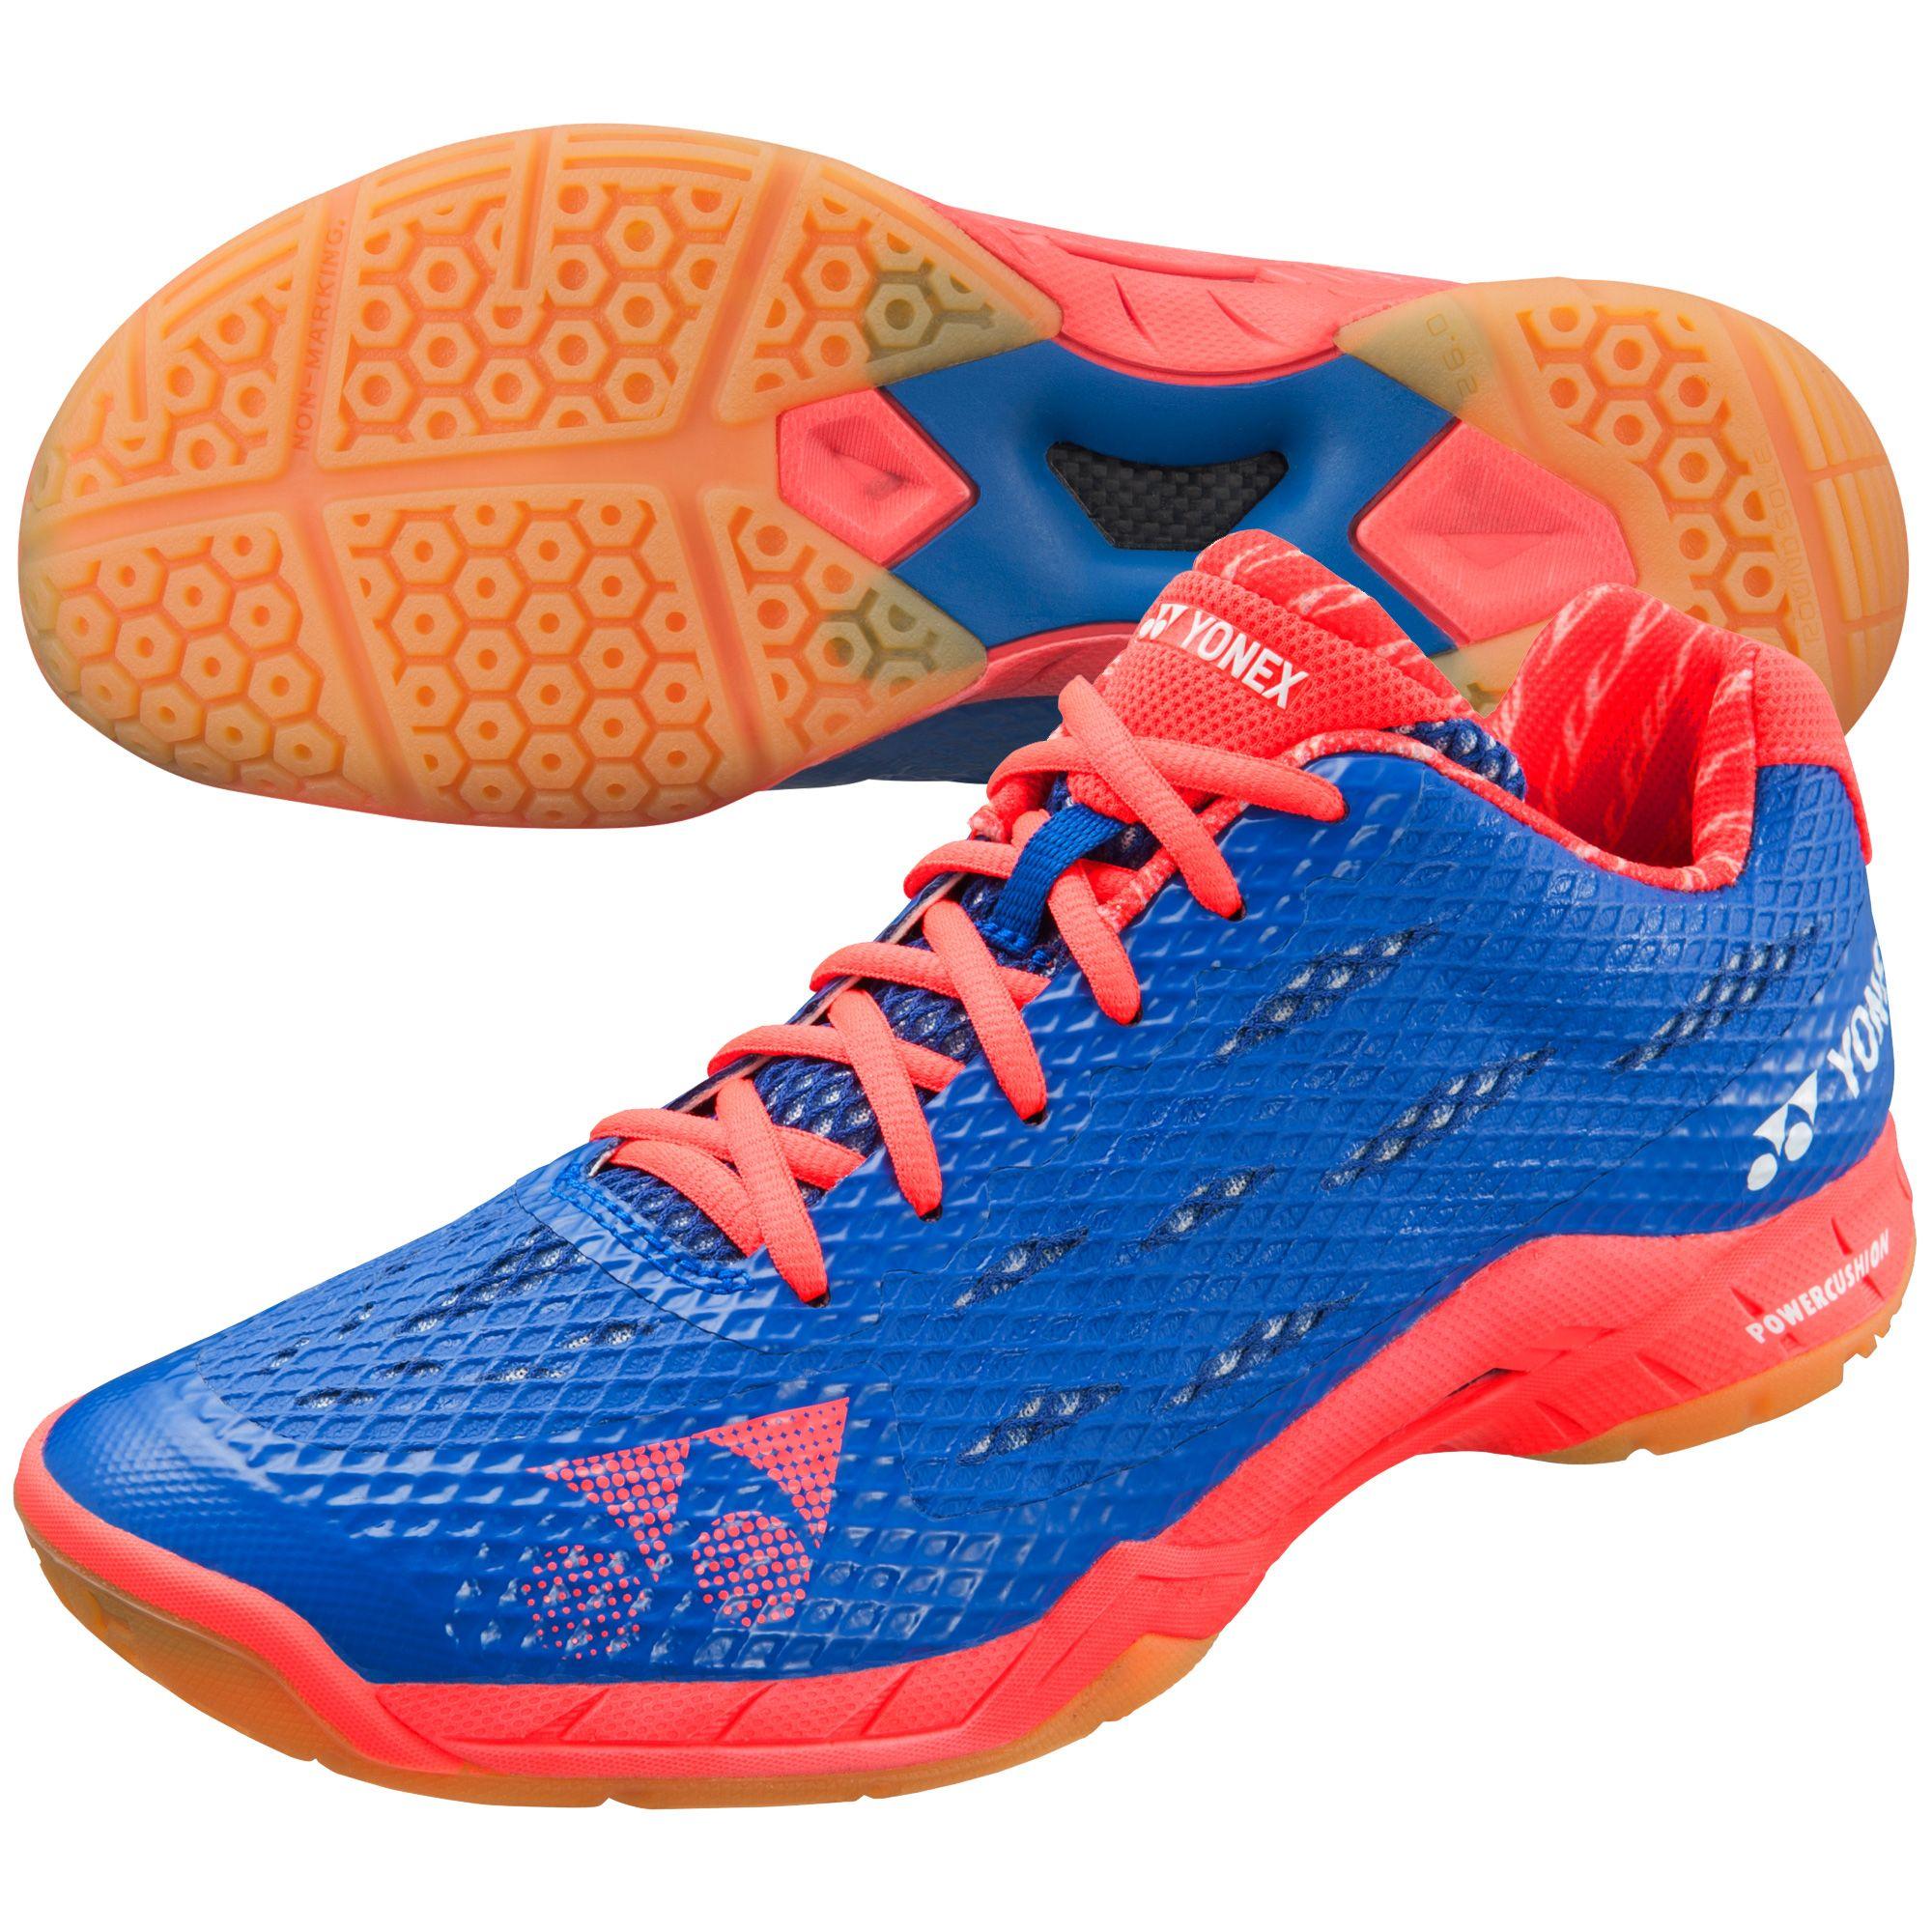 Yonex Power Cushion Aerus Badminton Shoes Review